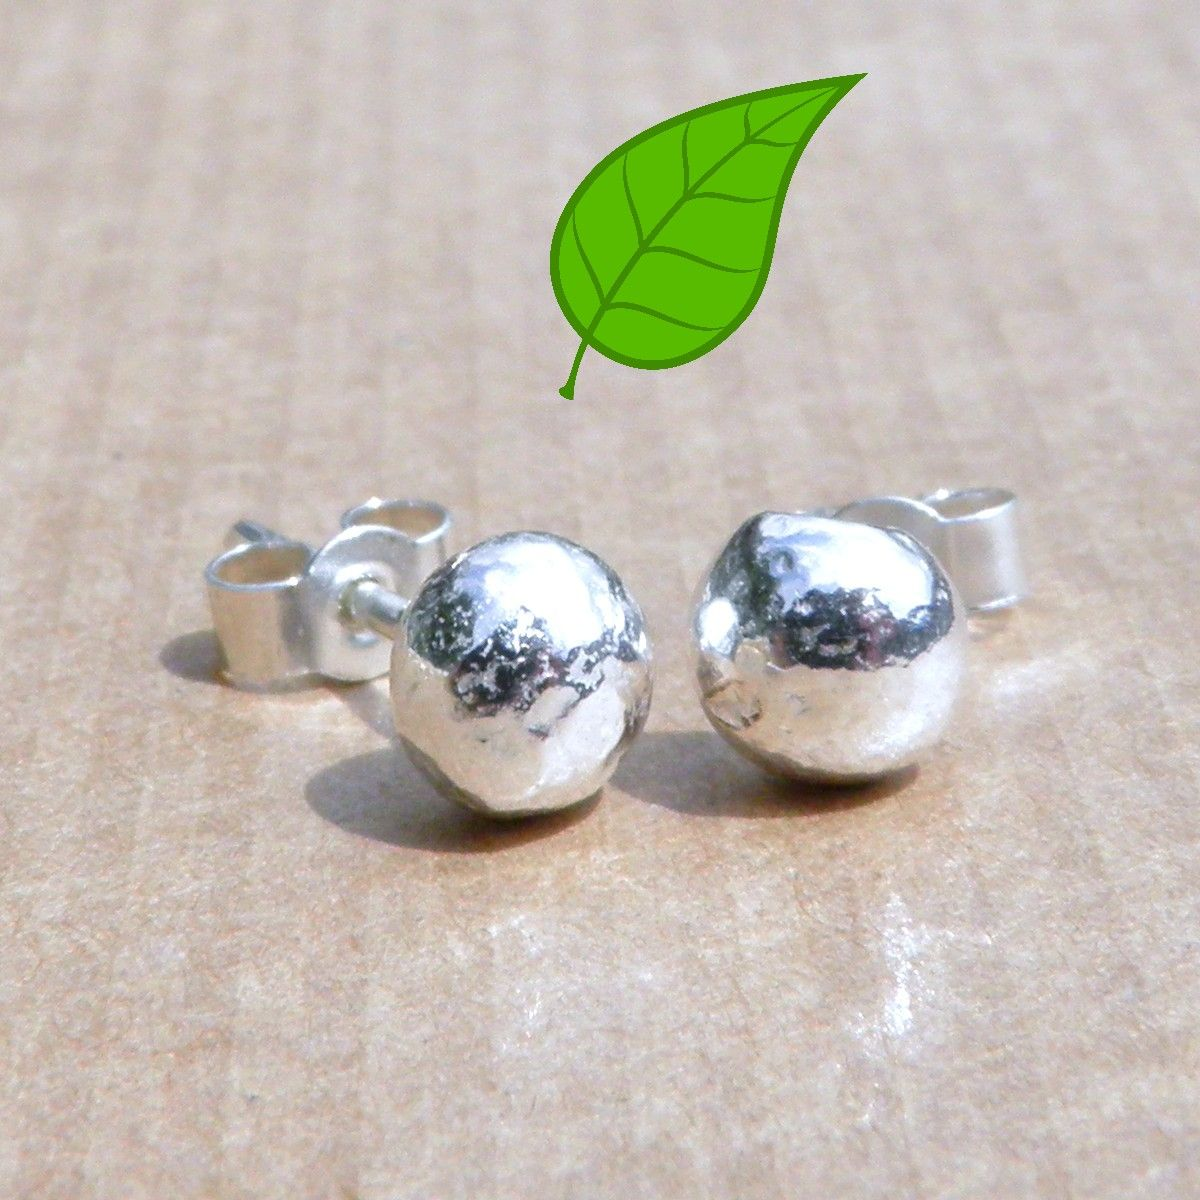 Ball Earrings | Nuggets - GCE14